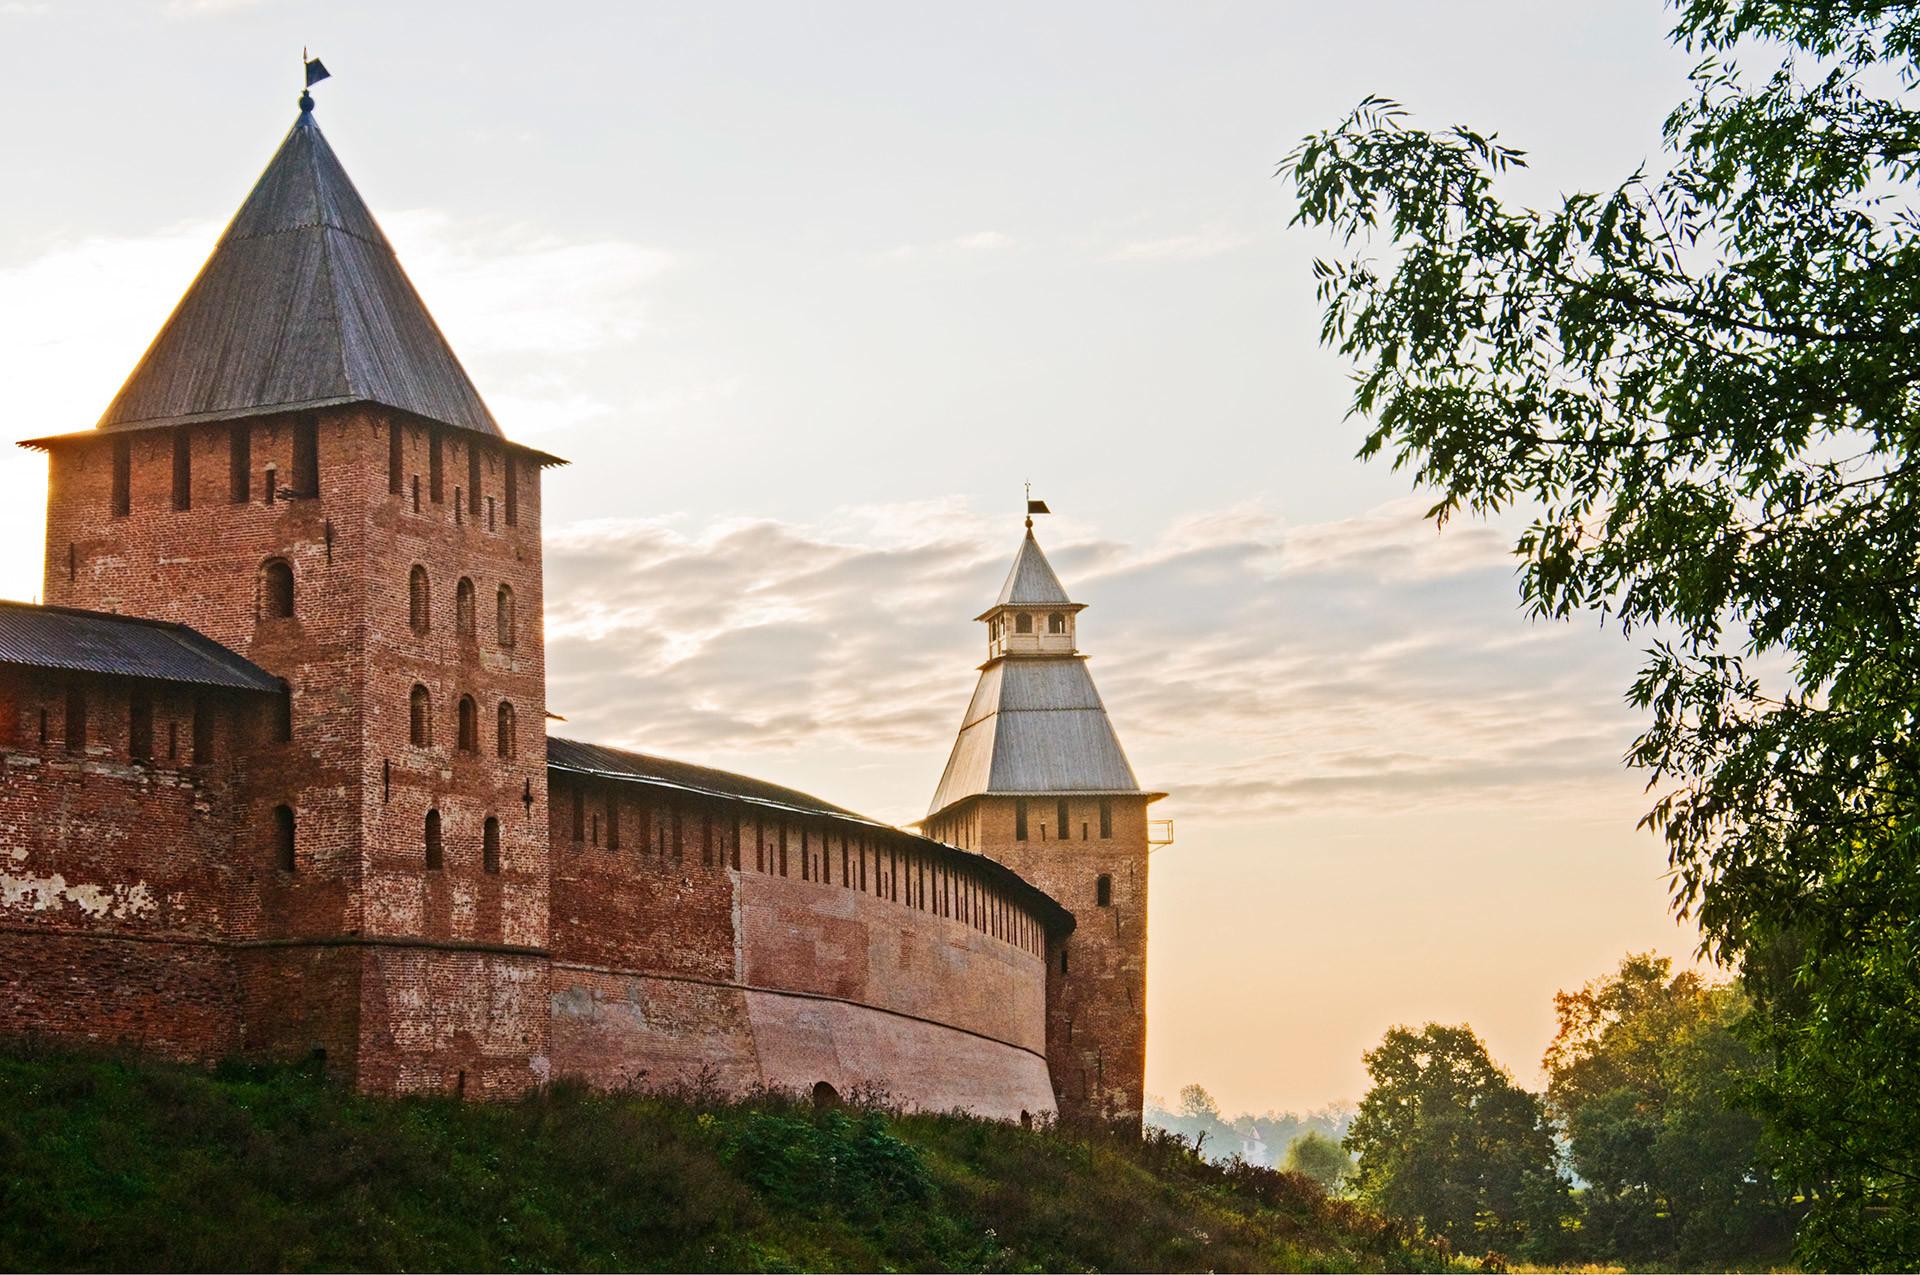 Dinding dan menara Kremlin yang dibangun kembali dengan batu bata pada abad ke-14. Veliky Novgorod, Rusia.